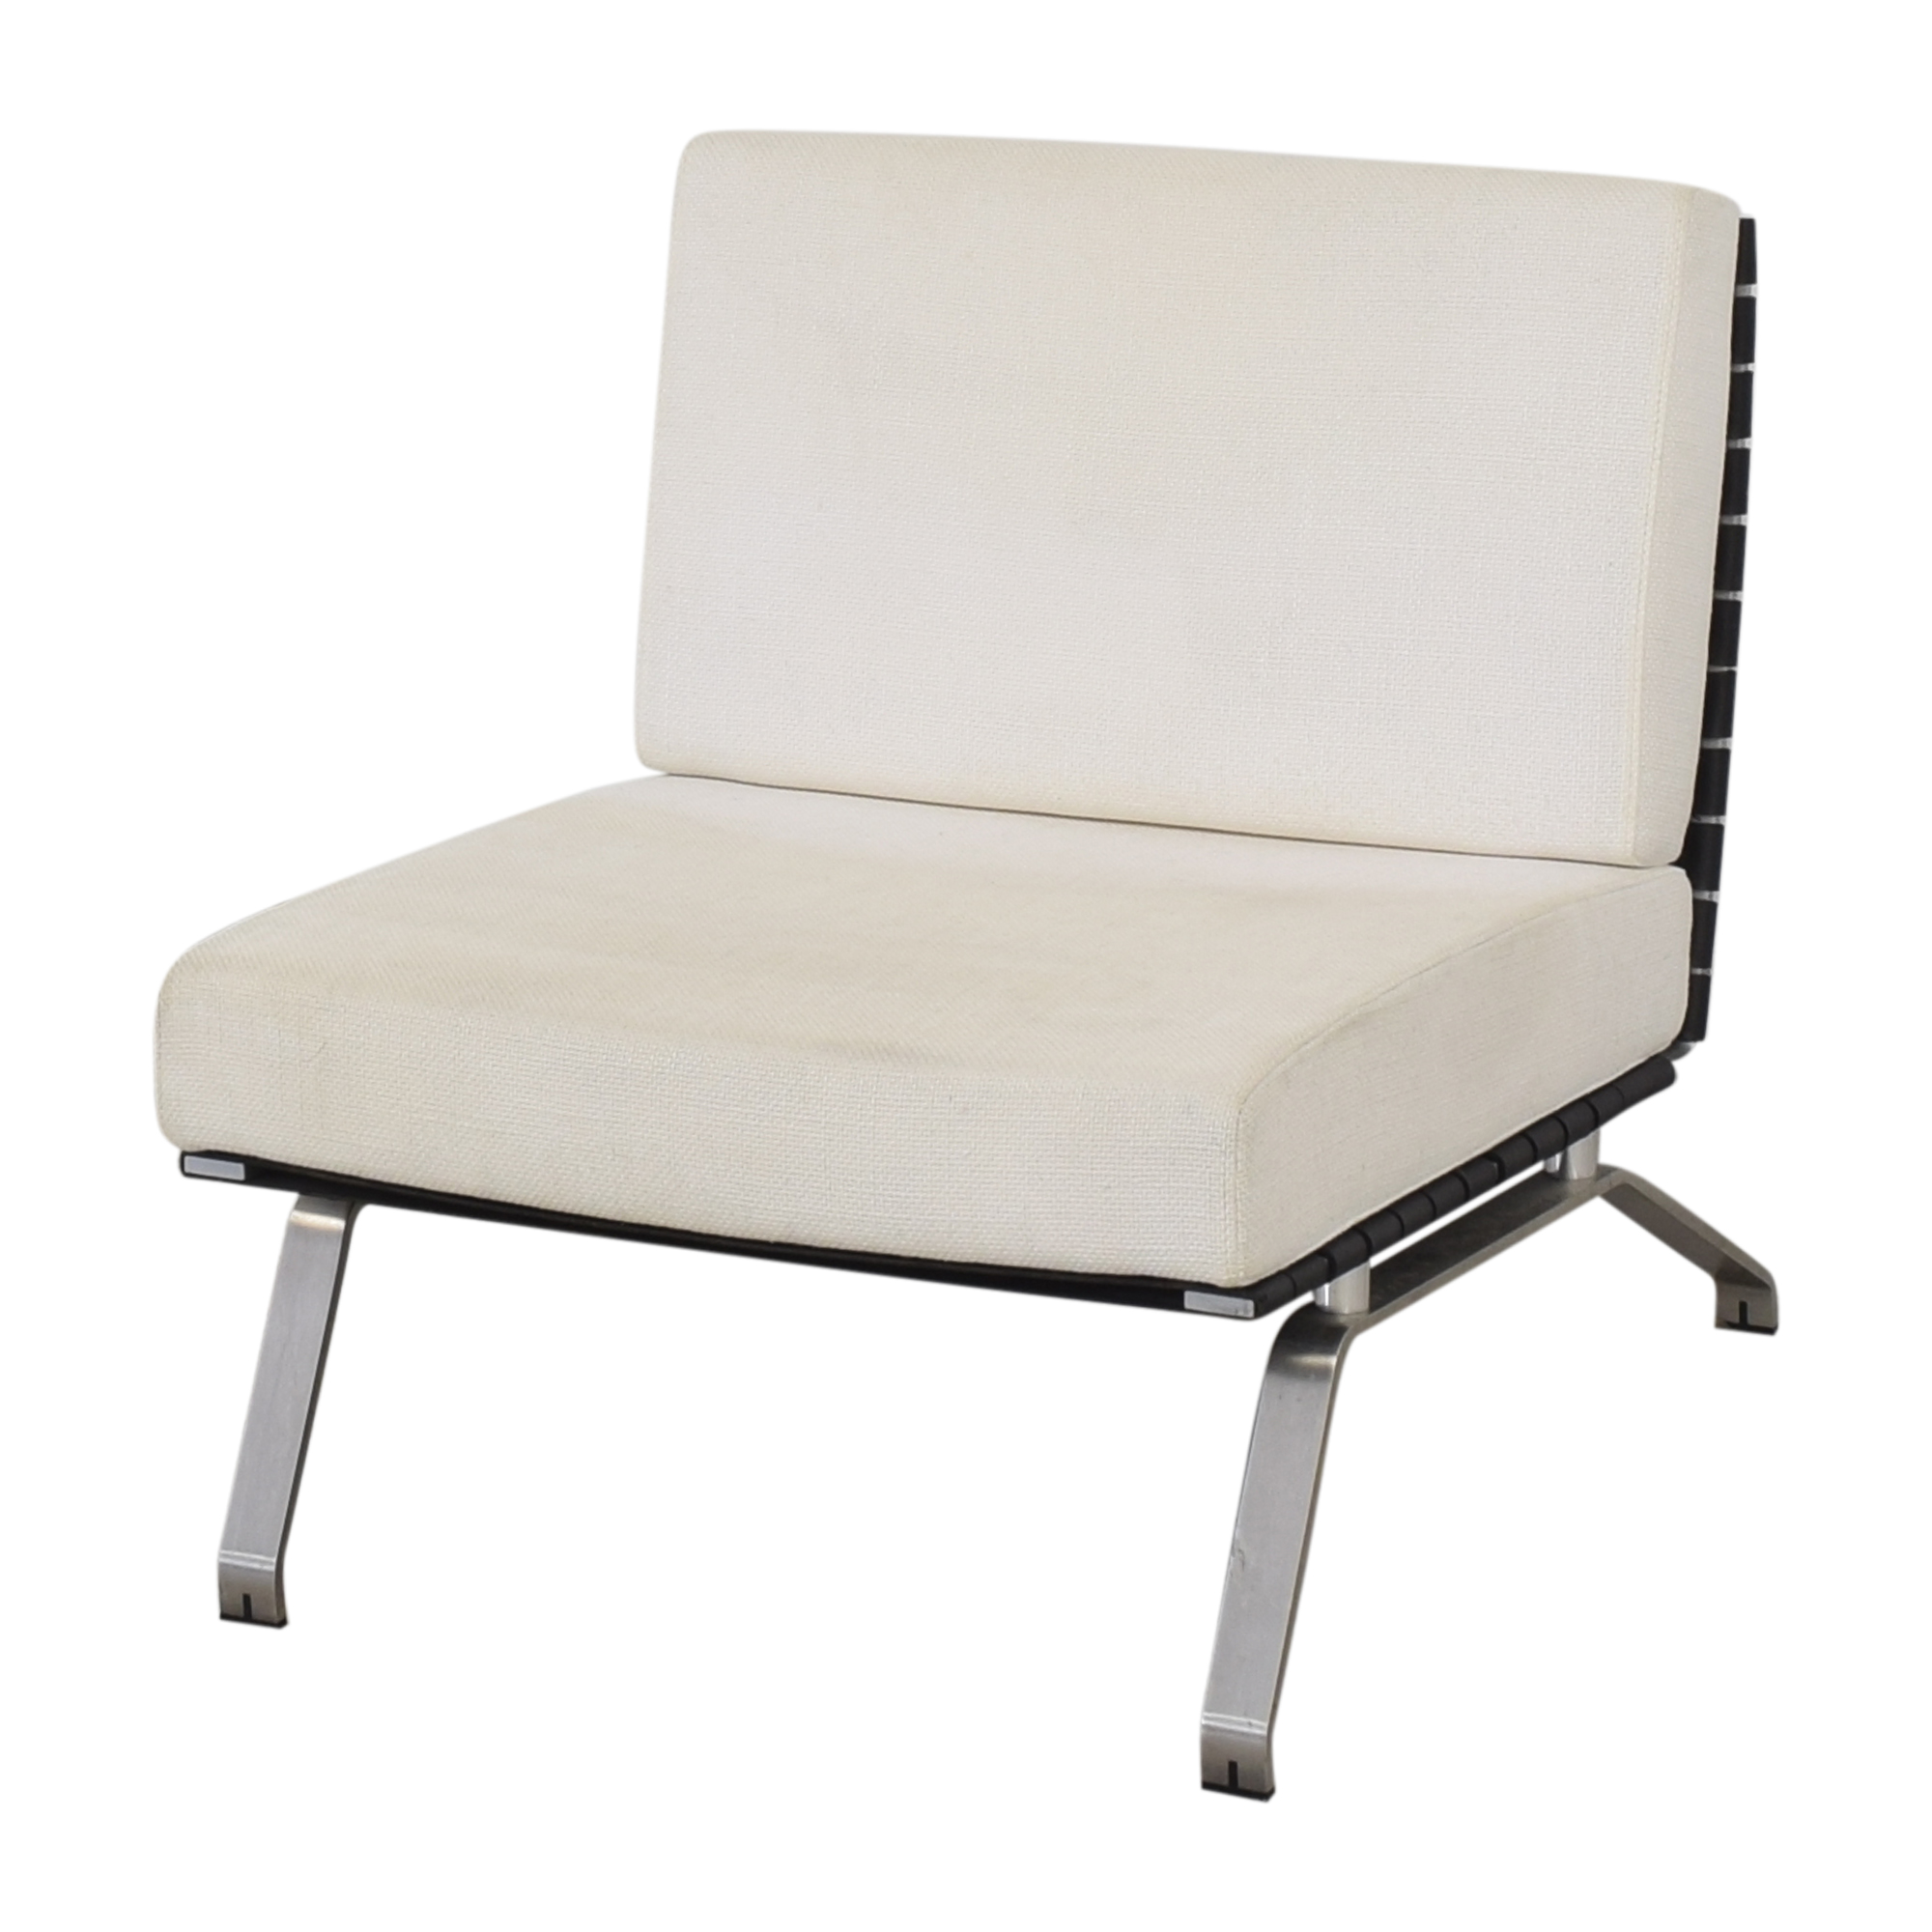 Ligne Roset Ligne Roset Flexus Chair coupon